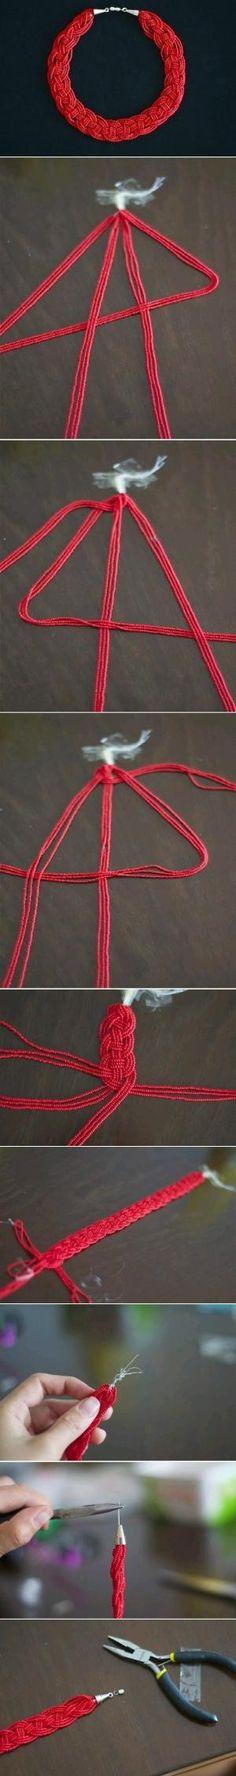 DIY braided bead necklace by batjas88